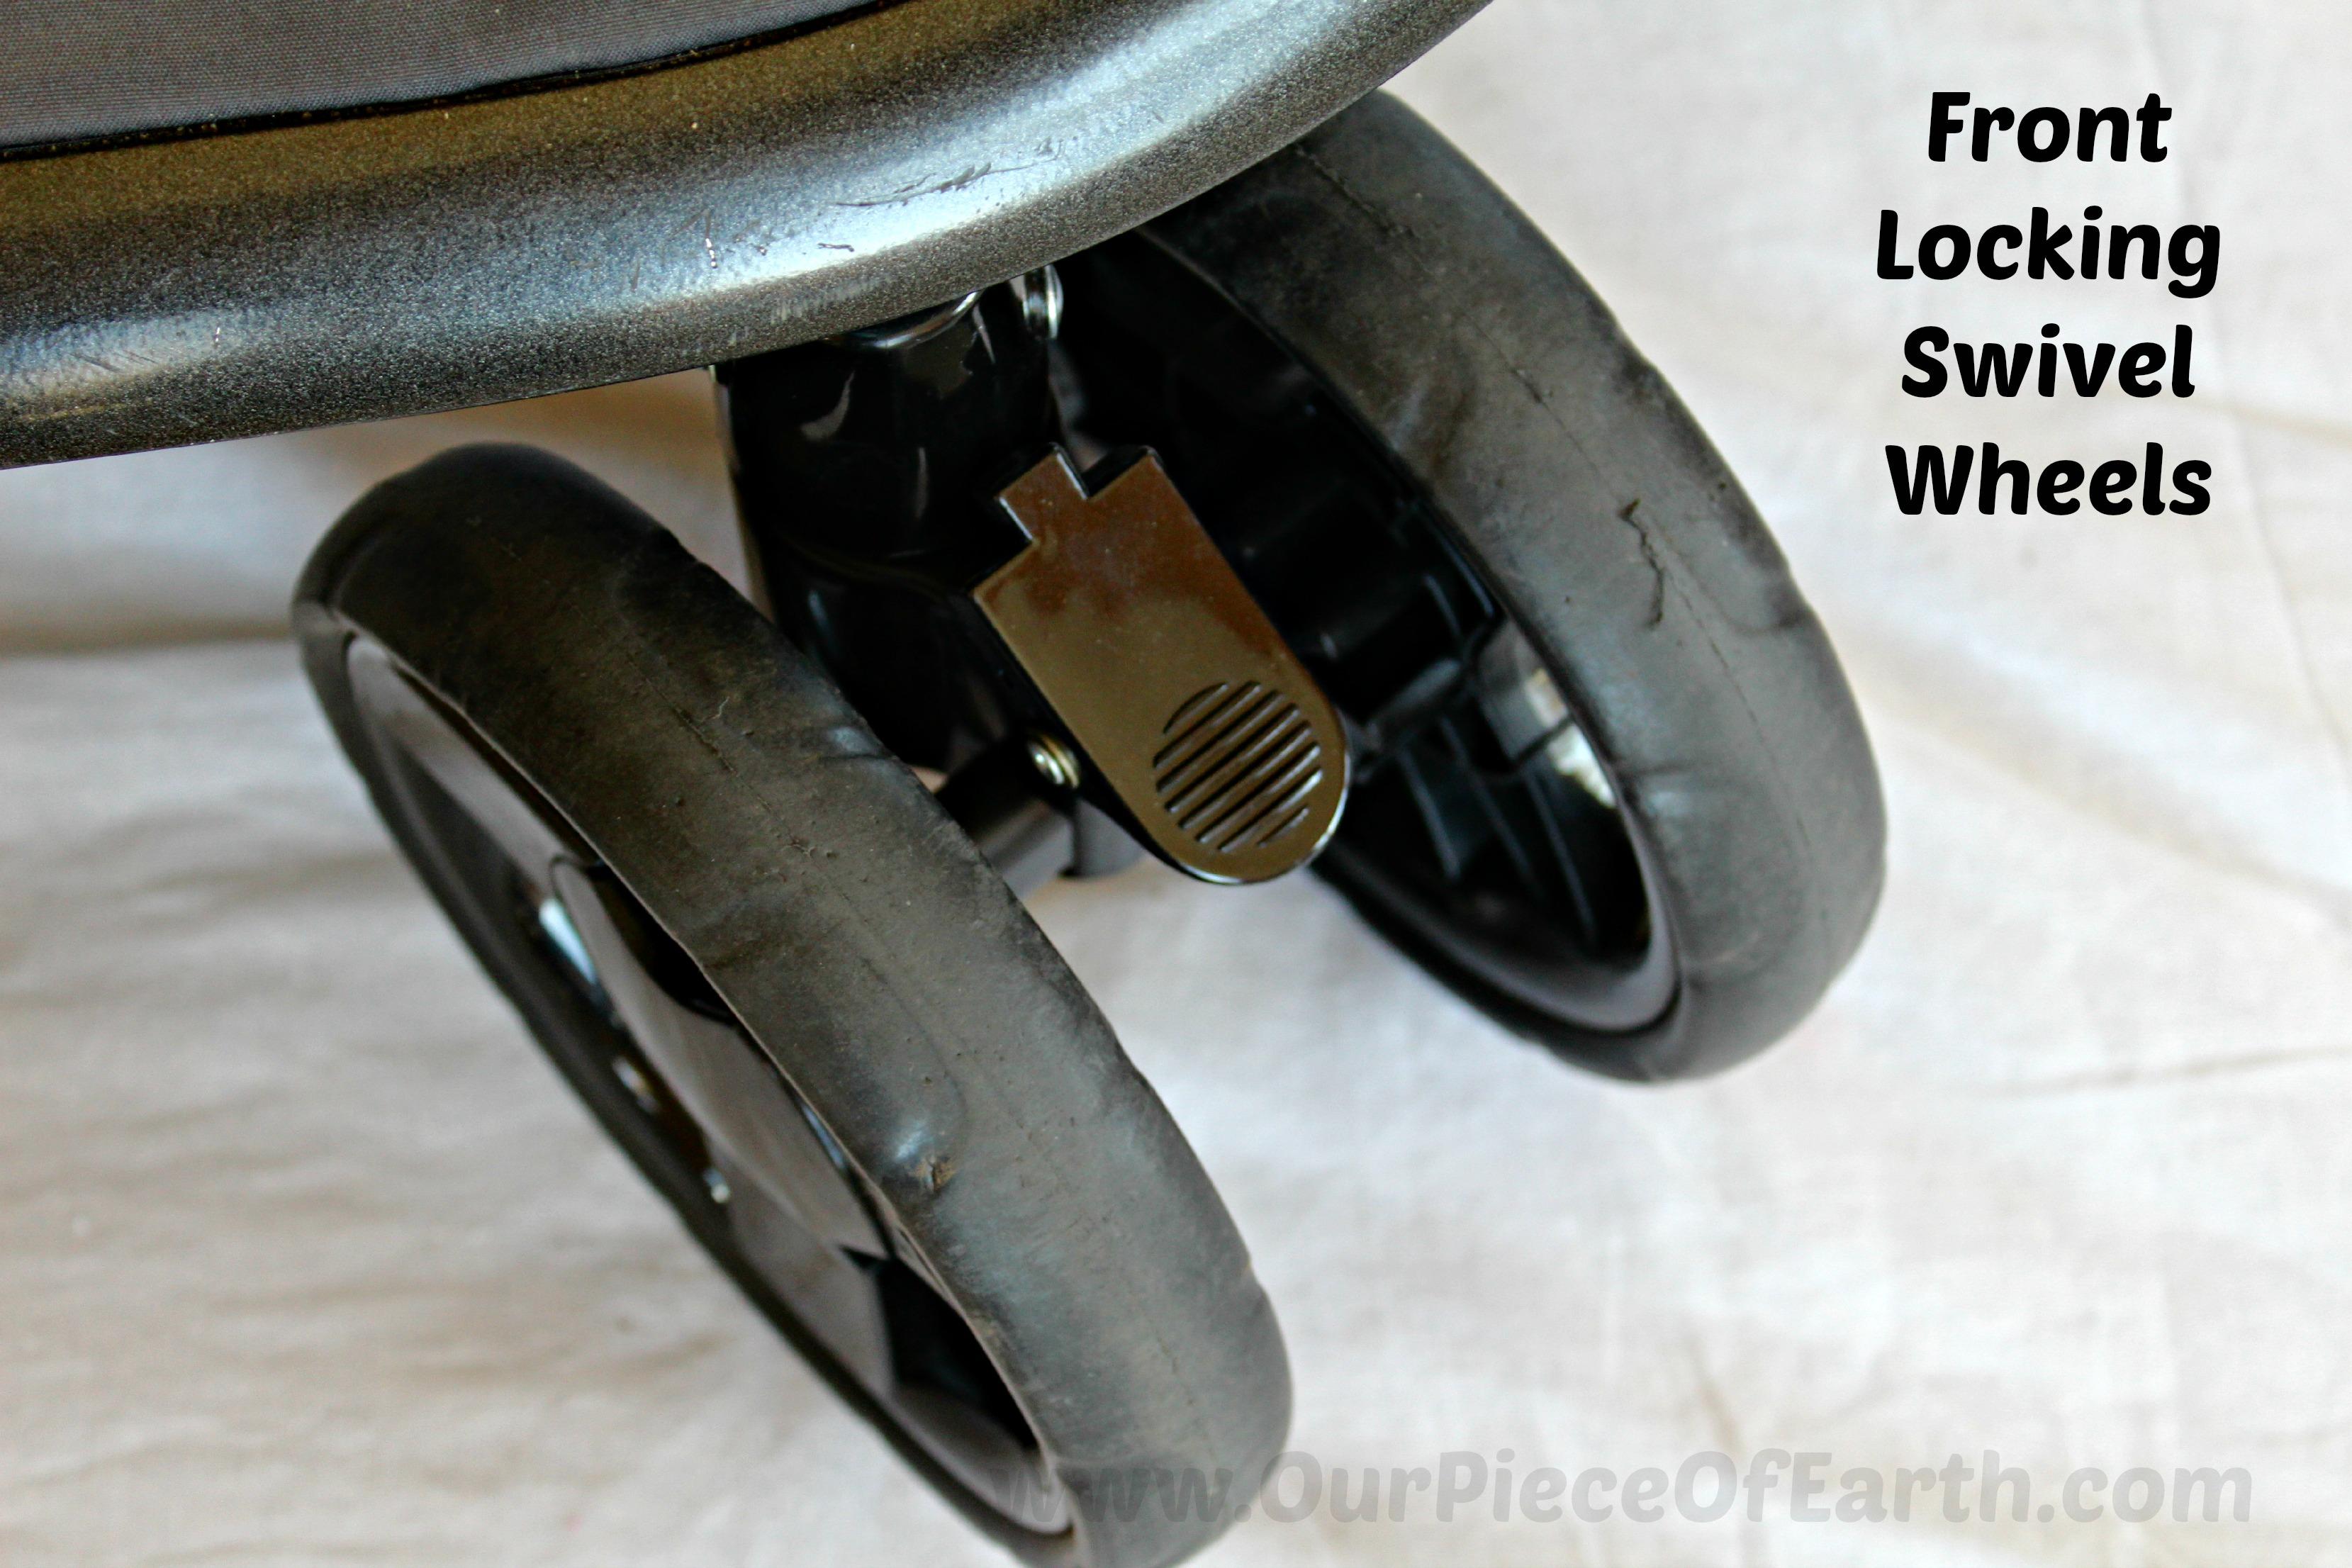 Combi Front Locking Swivel Wheels